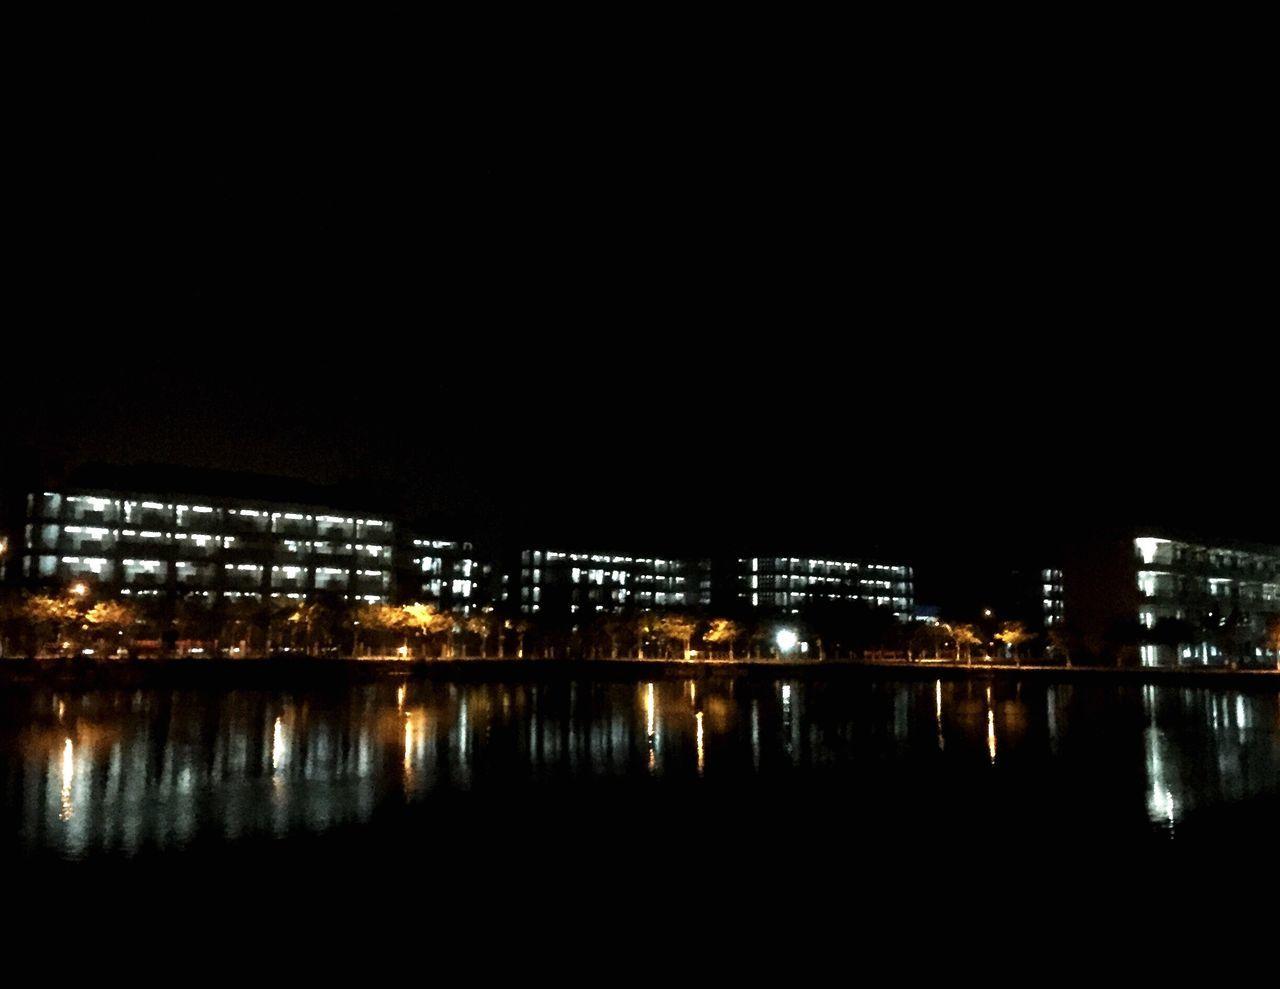 Night Reflection Sch school